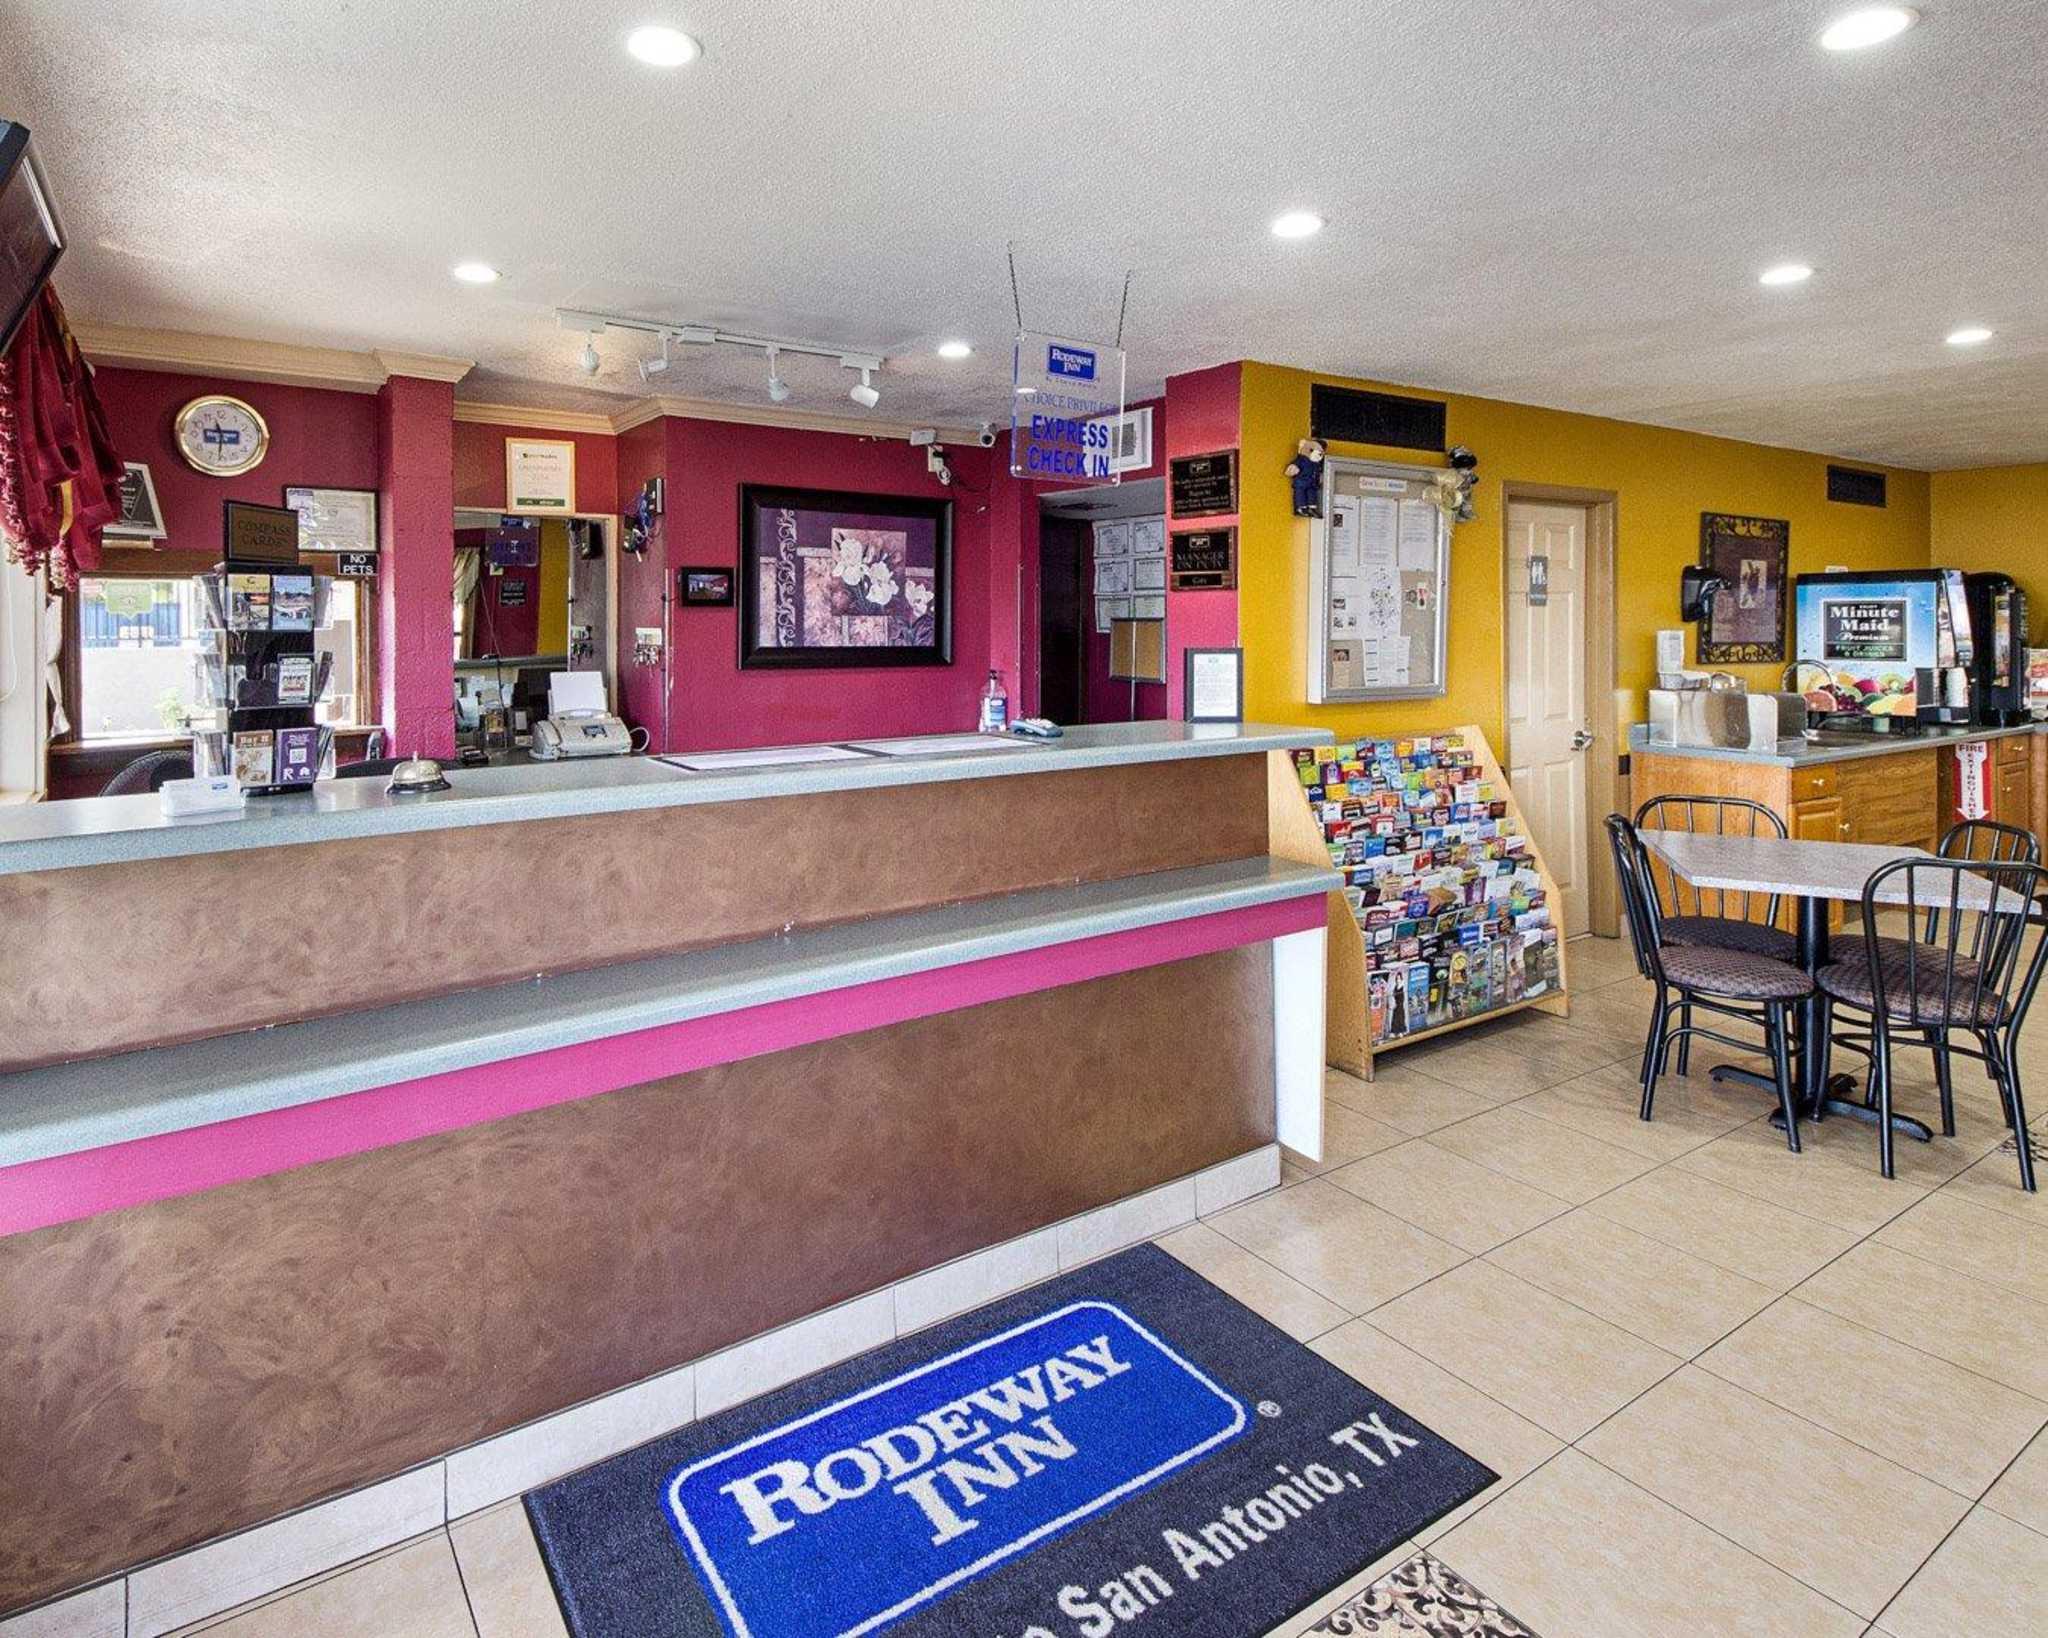 Rodeway Inn At Lackland AFB image 15